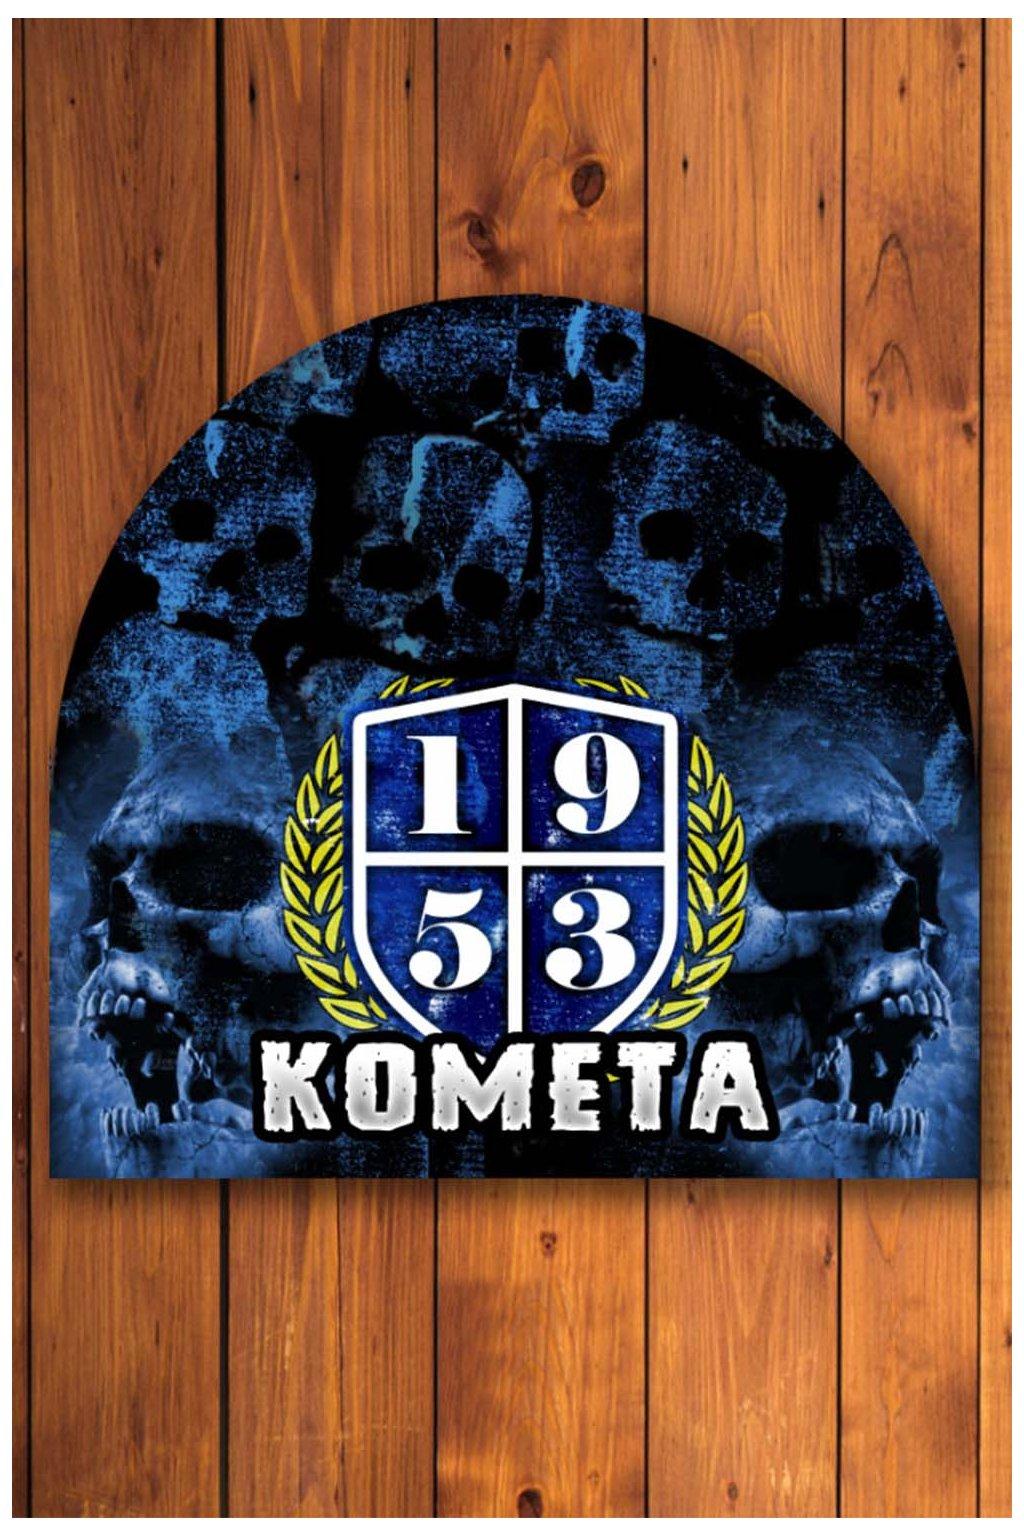 cepice kometa hd 01